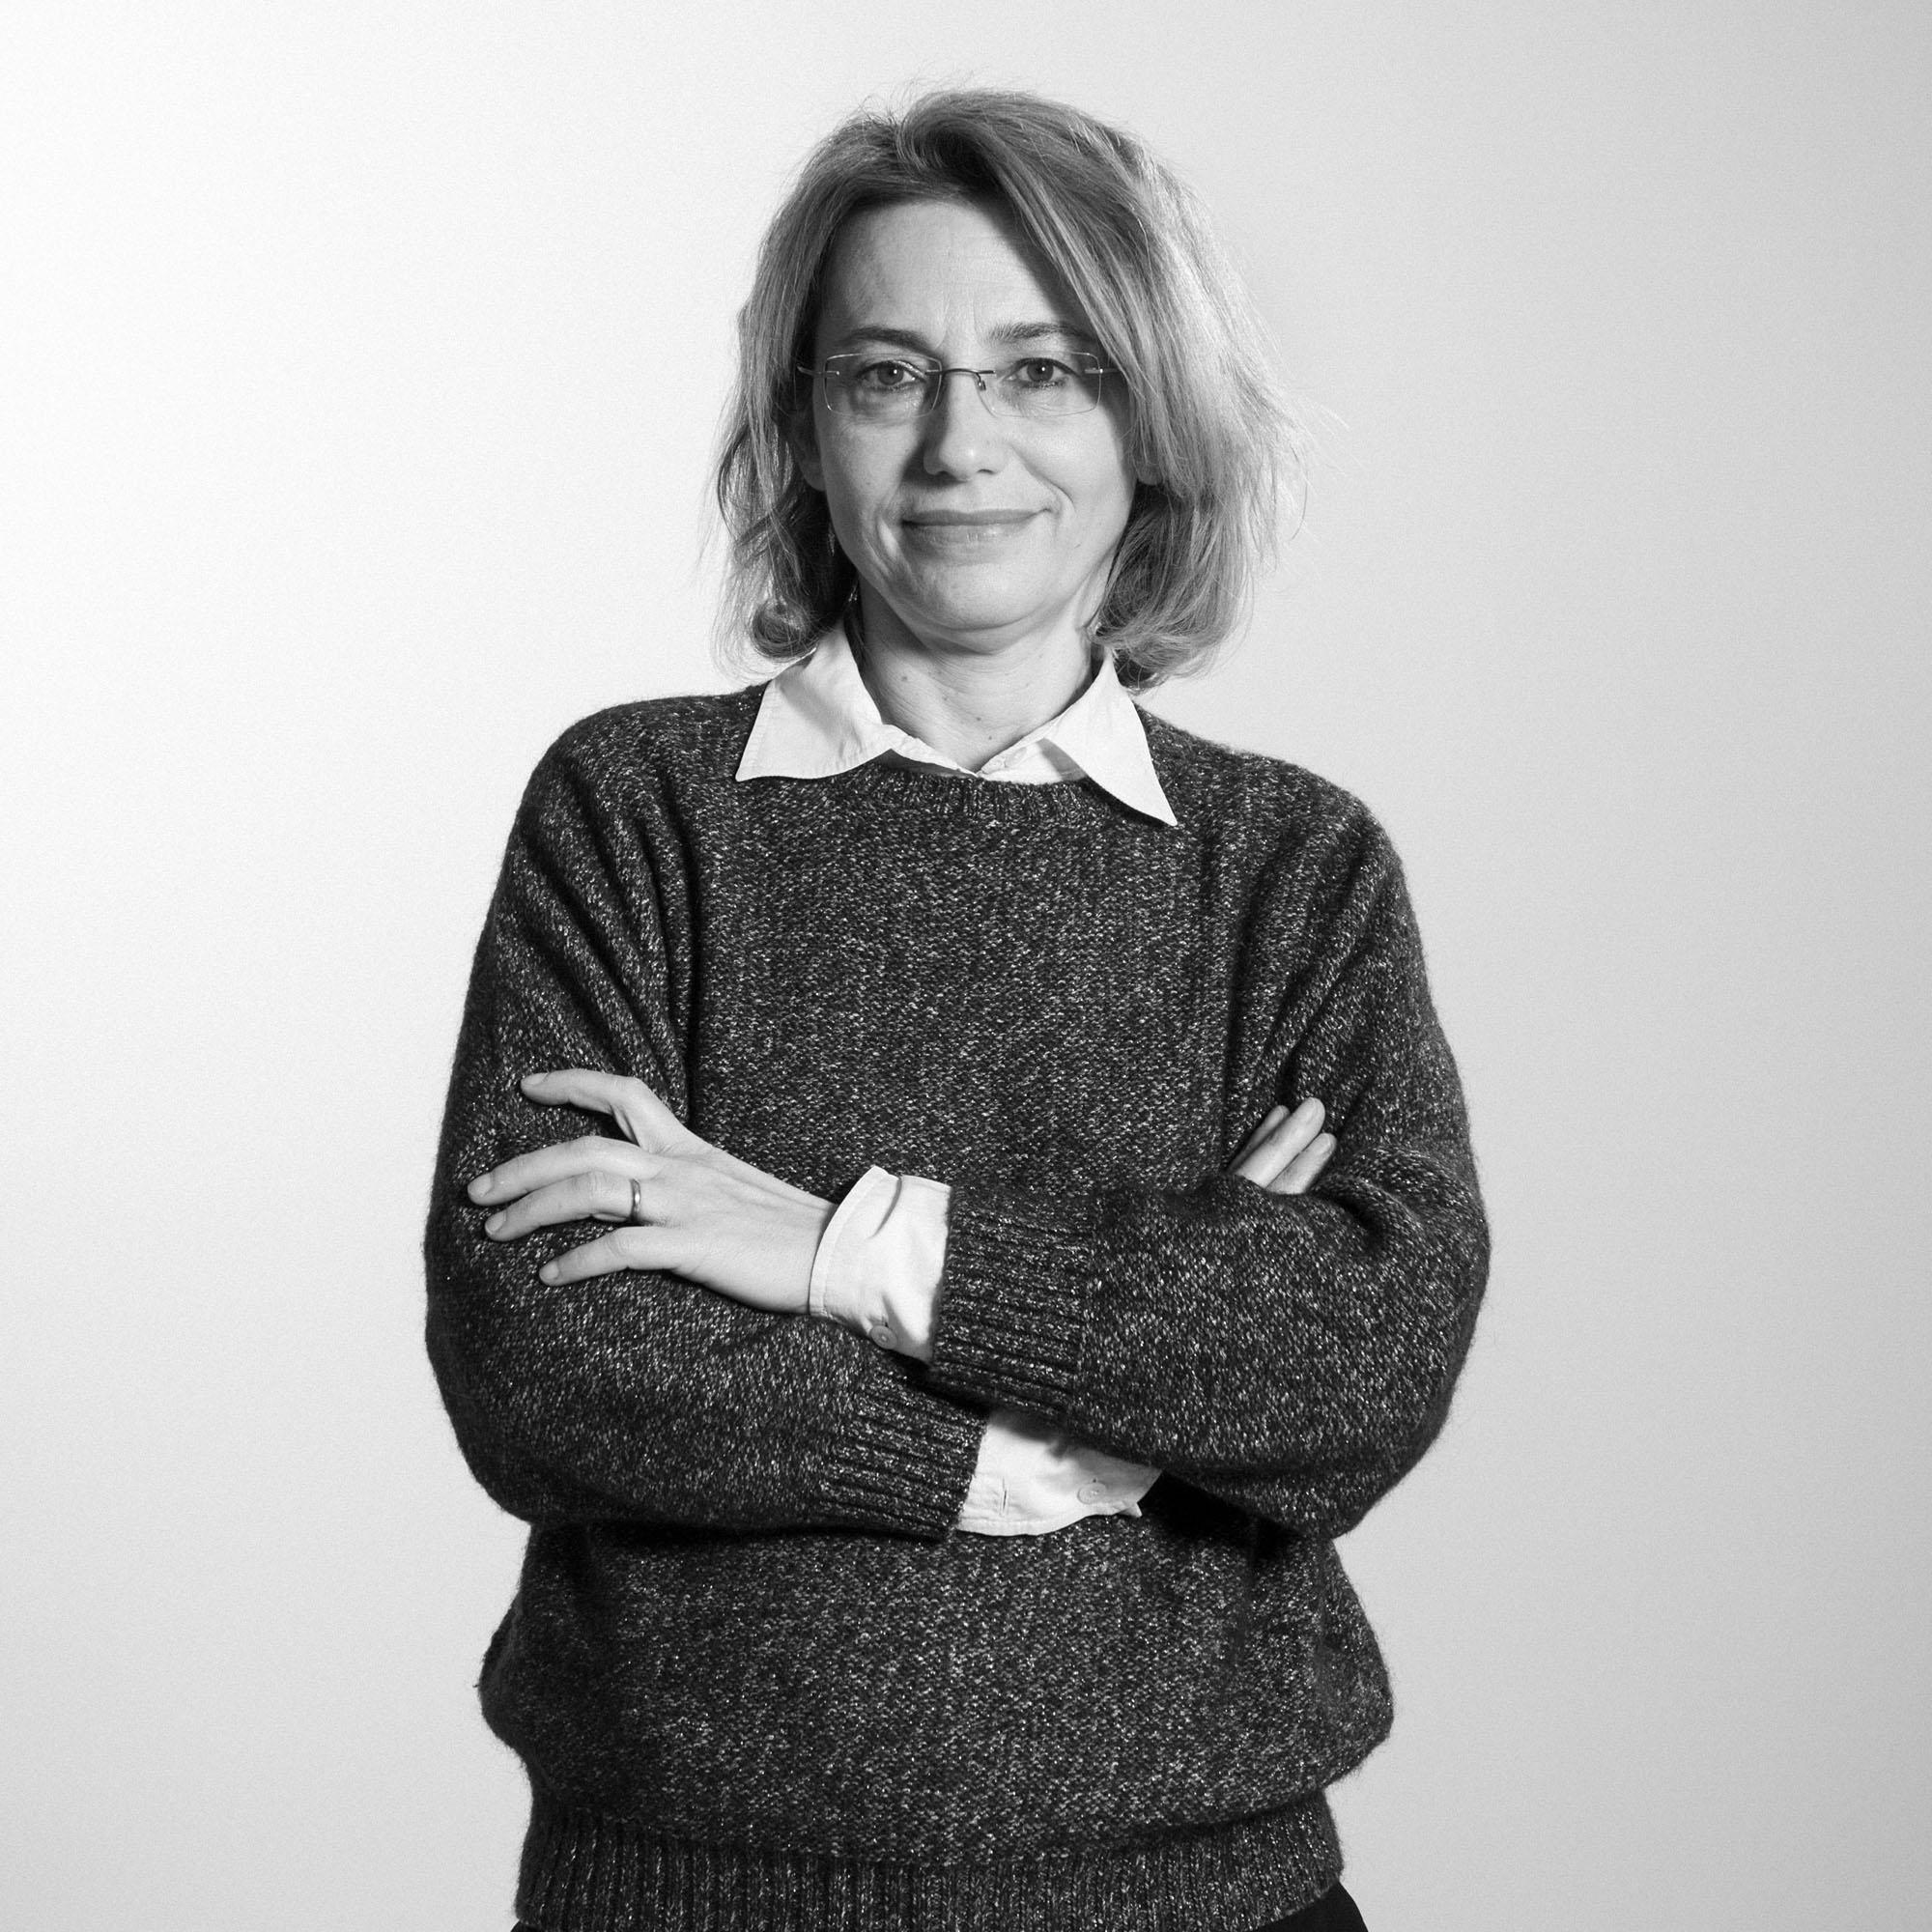 Elisabetta Proleven